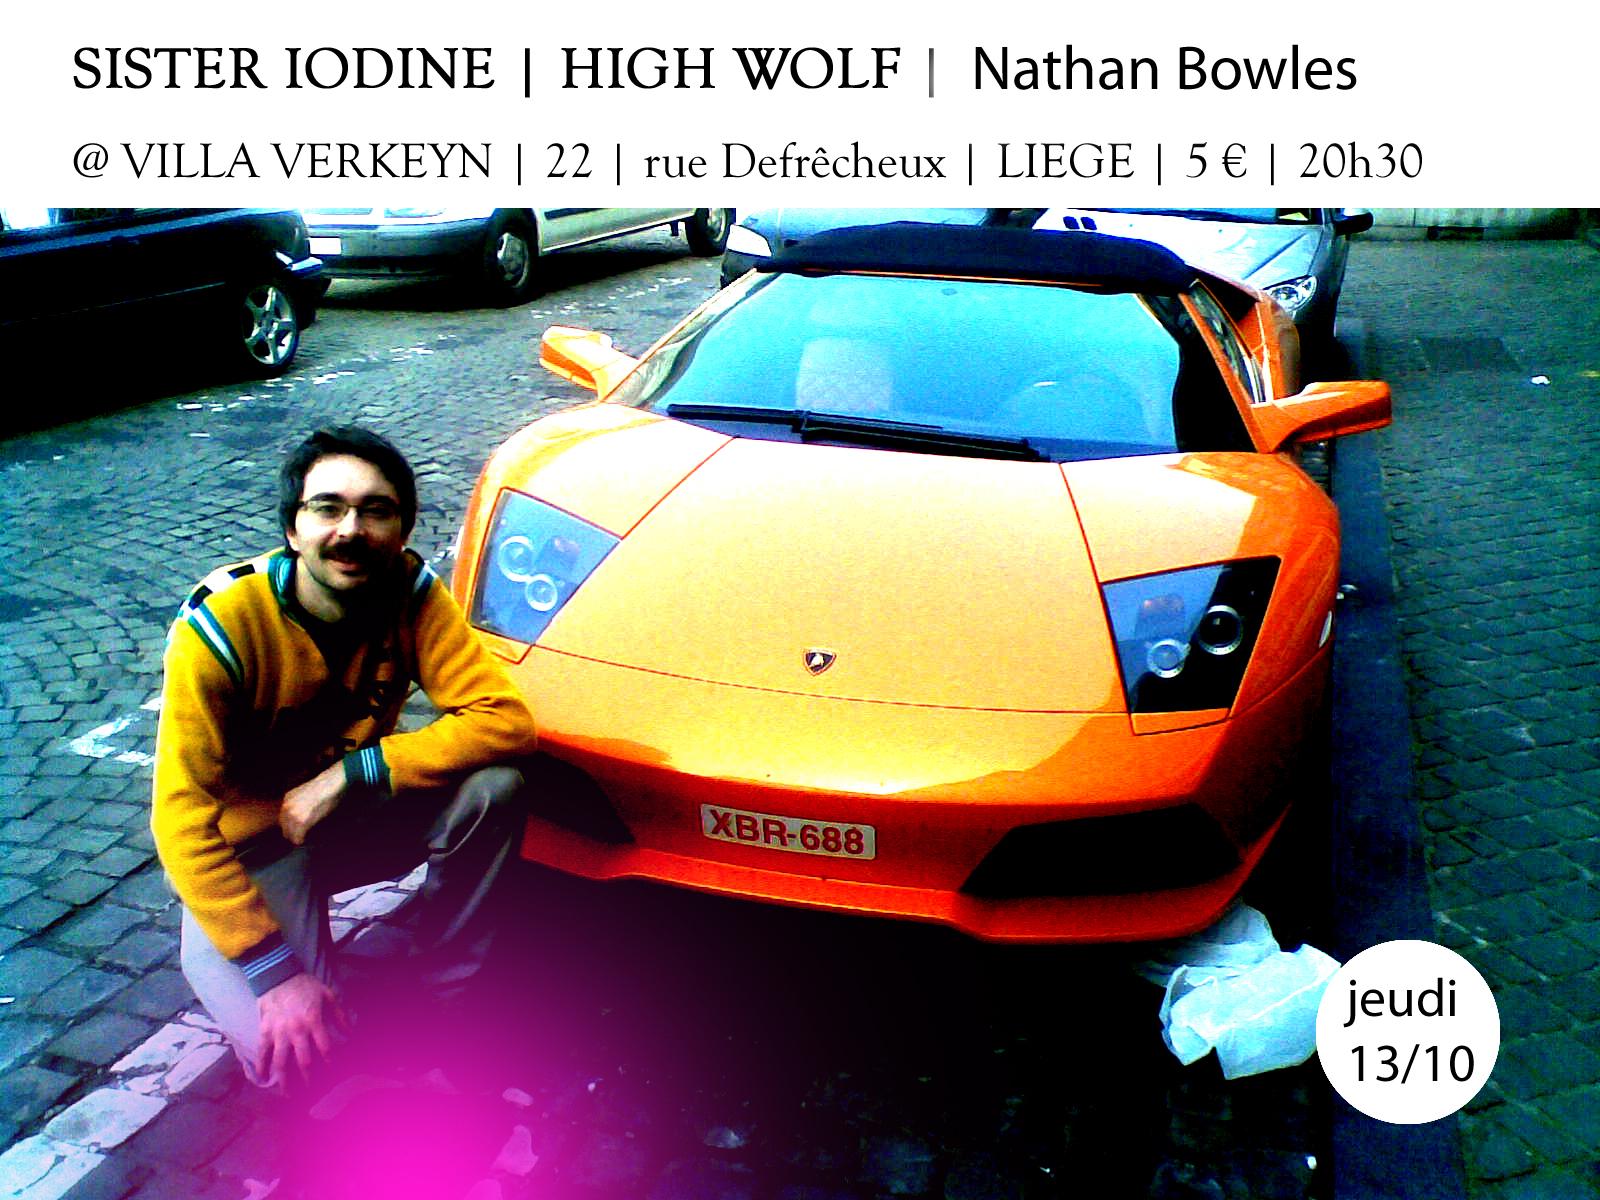 http://3.bp.blogspot.com/-bdigYR-T86Q/ToxHYNEBAvI/AAAAAAAAAyI/nF08fyf6cHQ/s1600/sister+iodine_high+wolf_jesuislepetitchevalier_modifi%25C3%25A9-1+copie.jpg